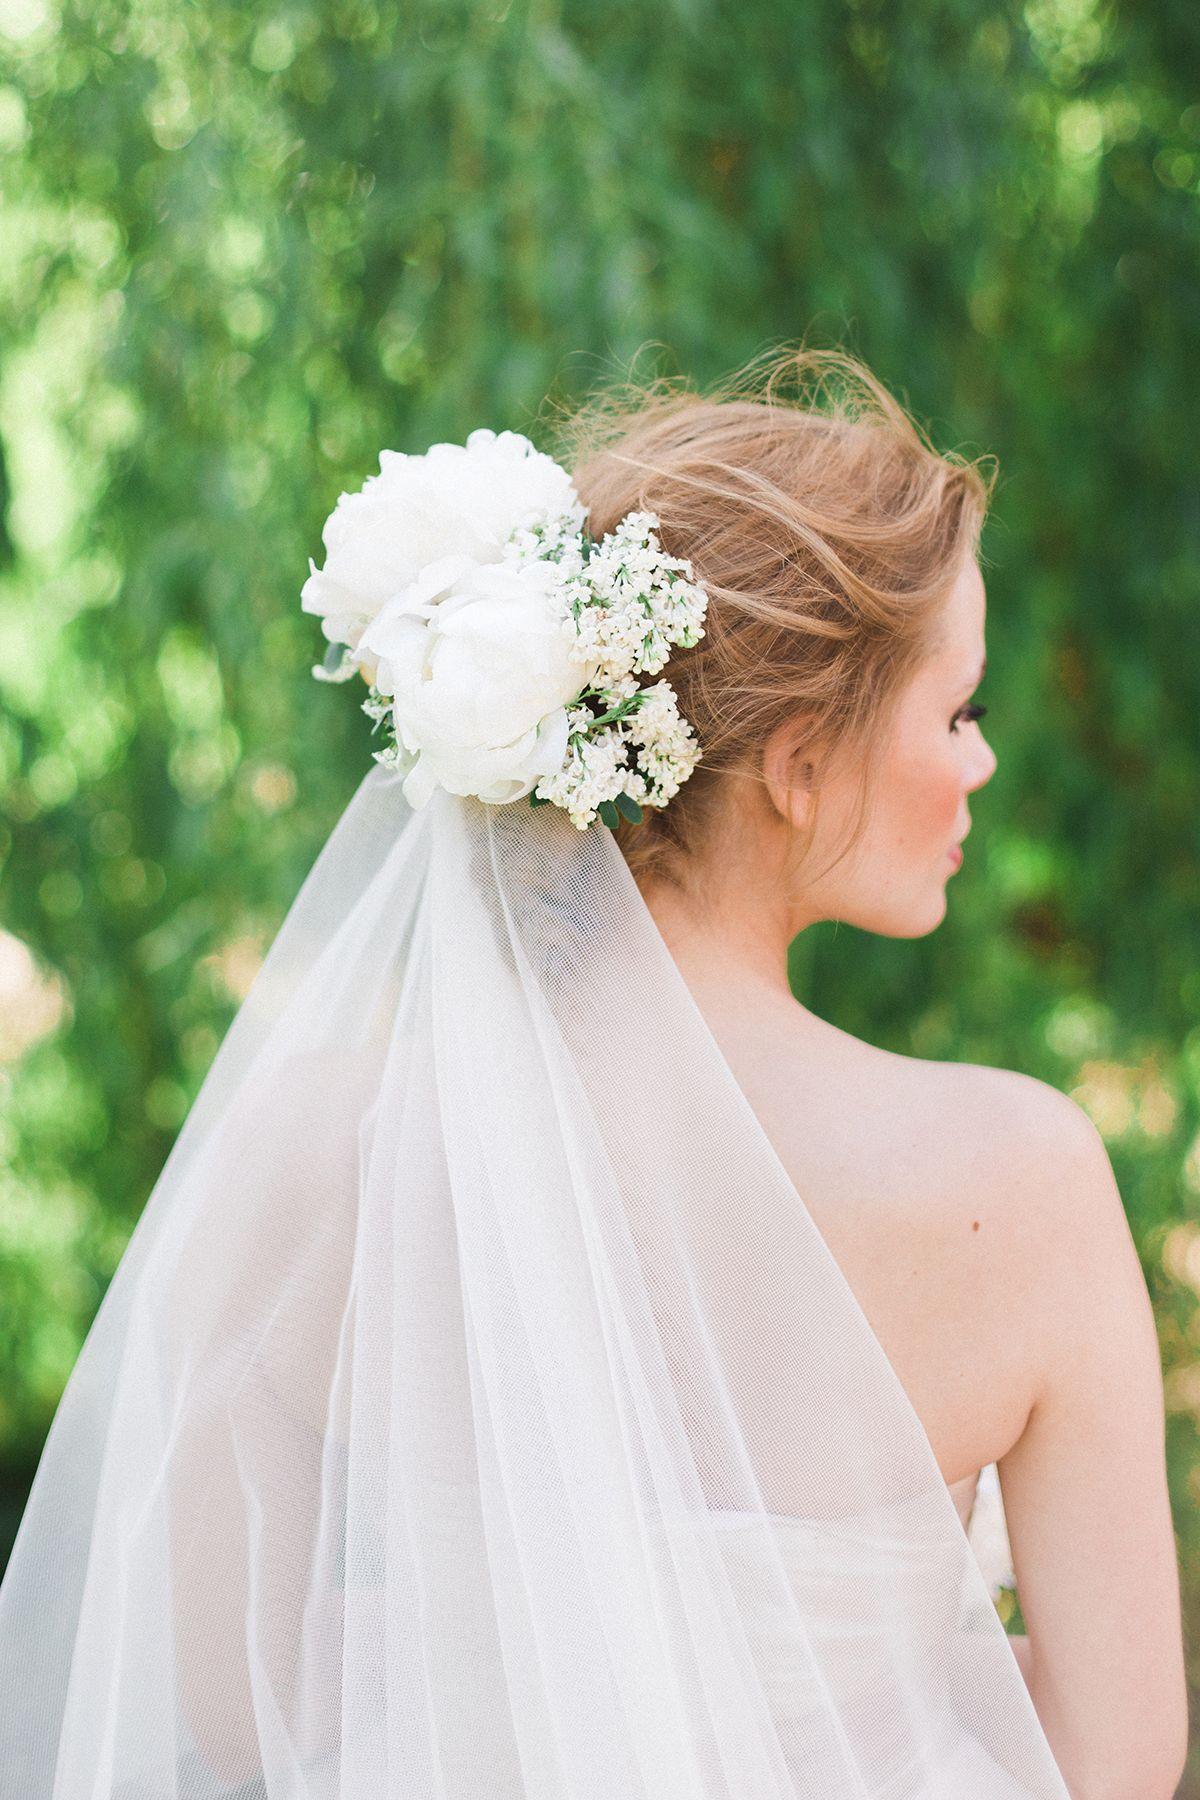 wedding hair with flowers & veil | bridal hair inspiration